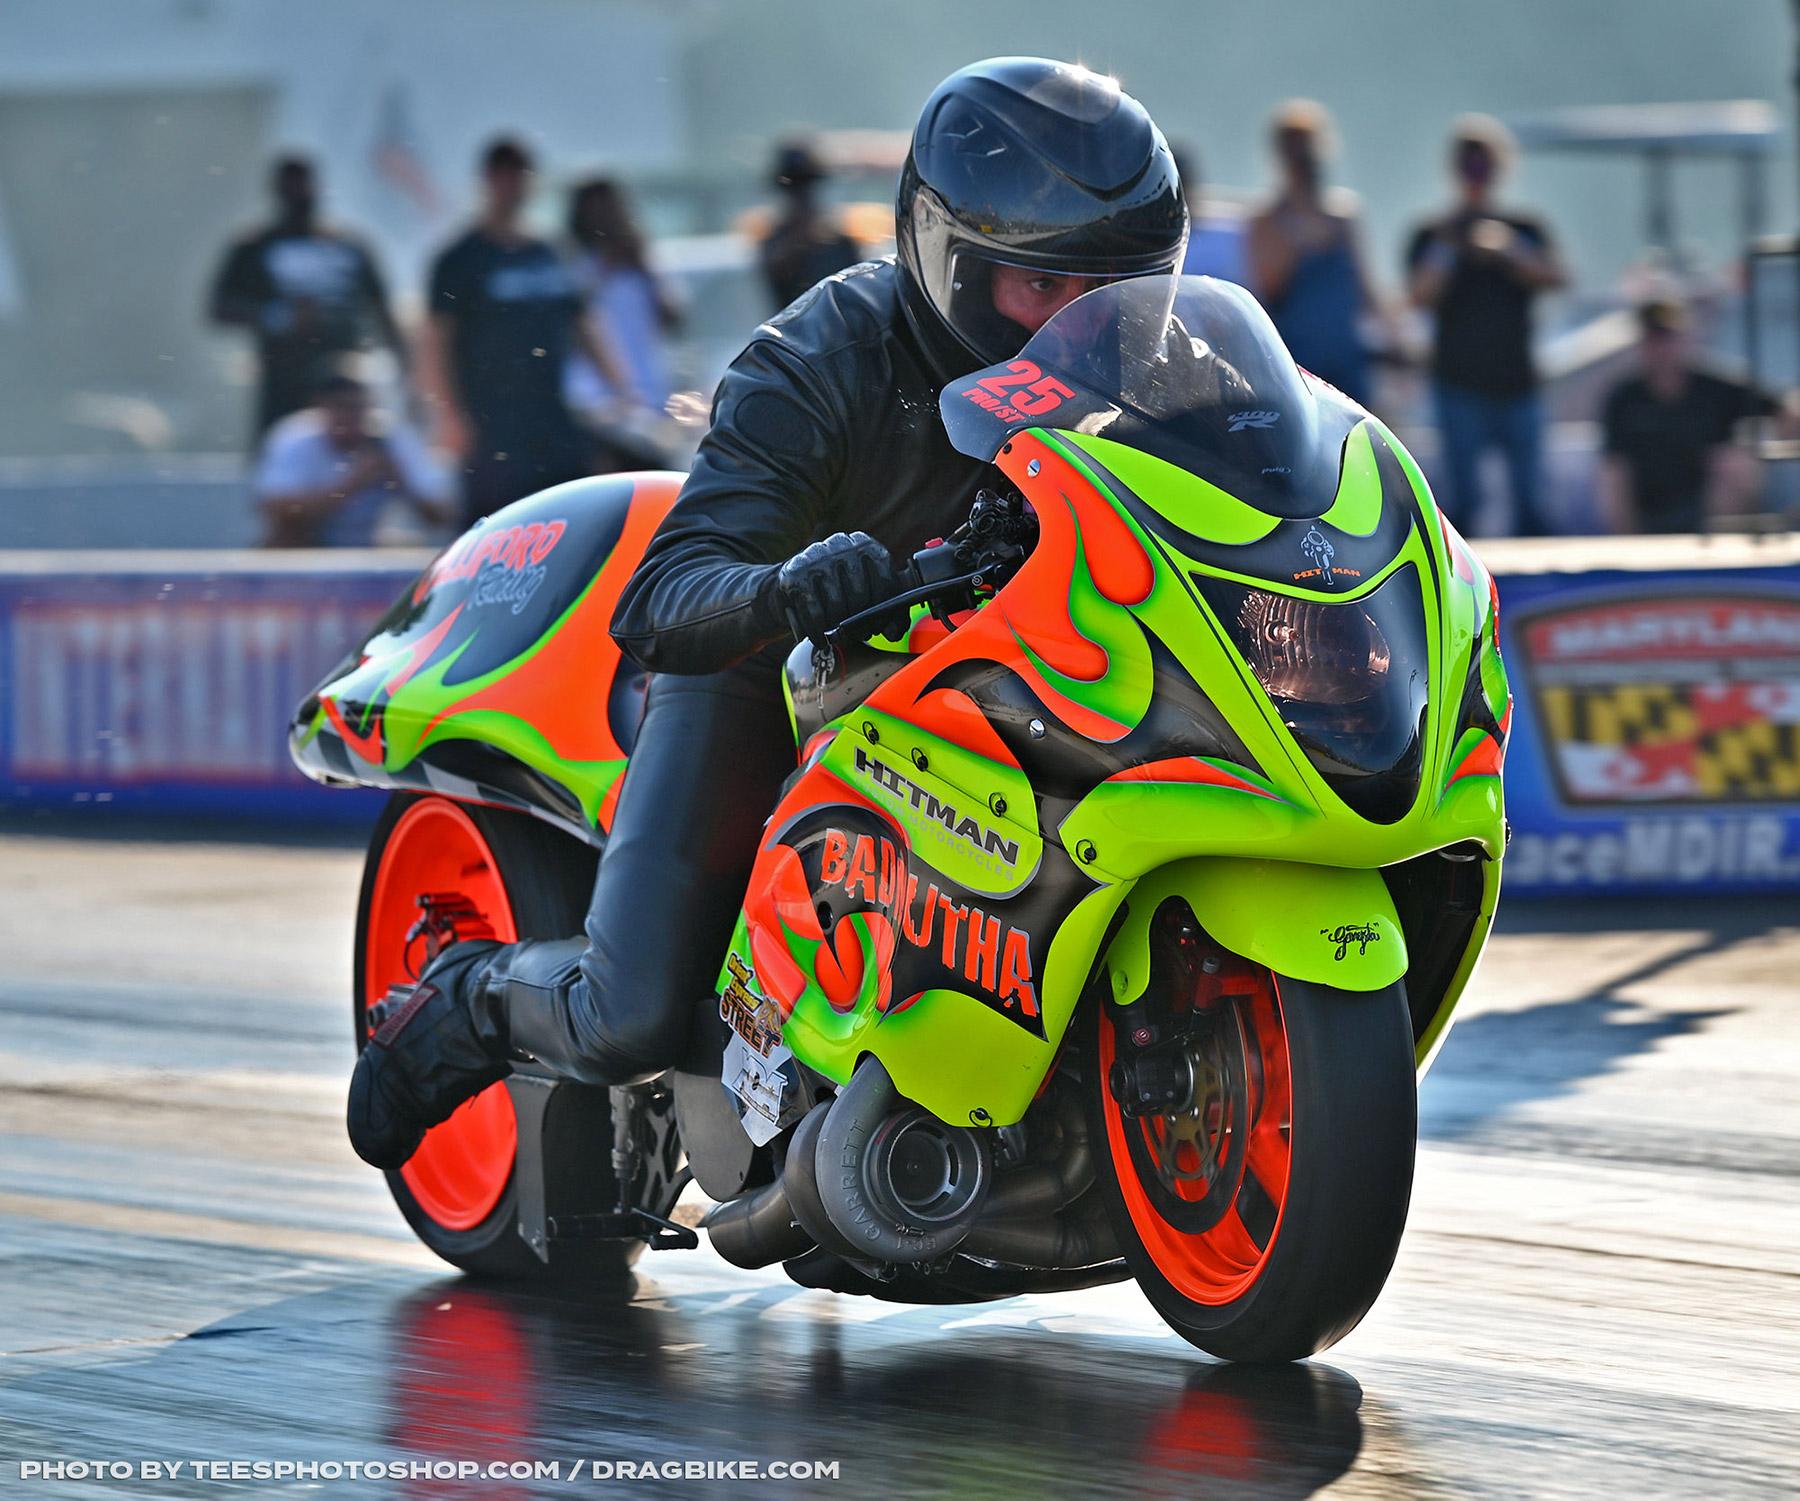 Mark Gargiulo - 2020 XDA Motorcycle Drag Racing